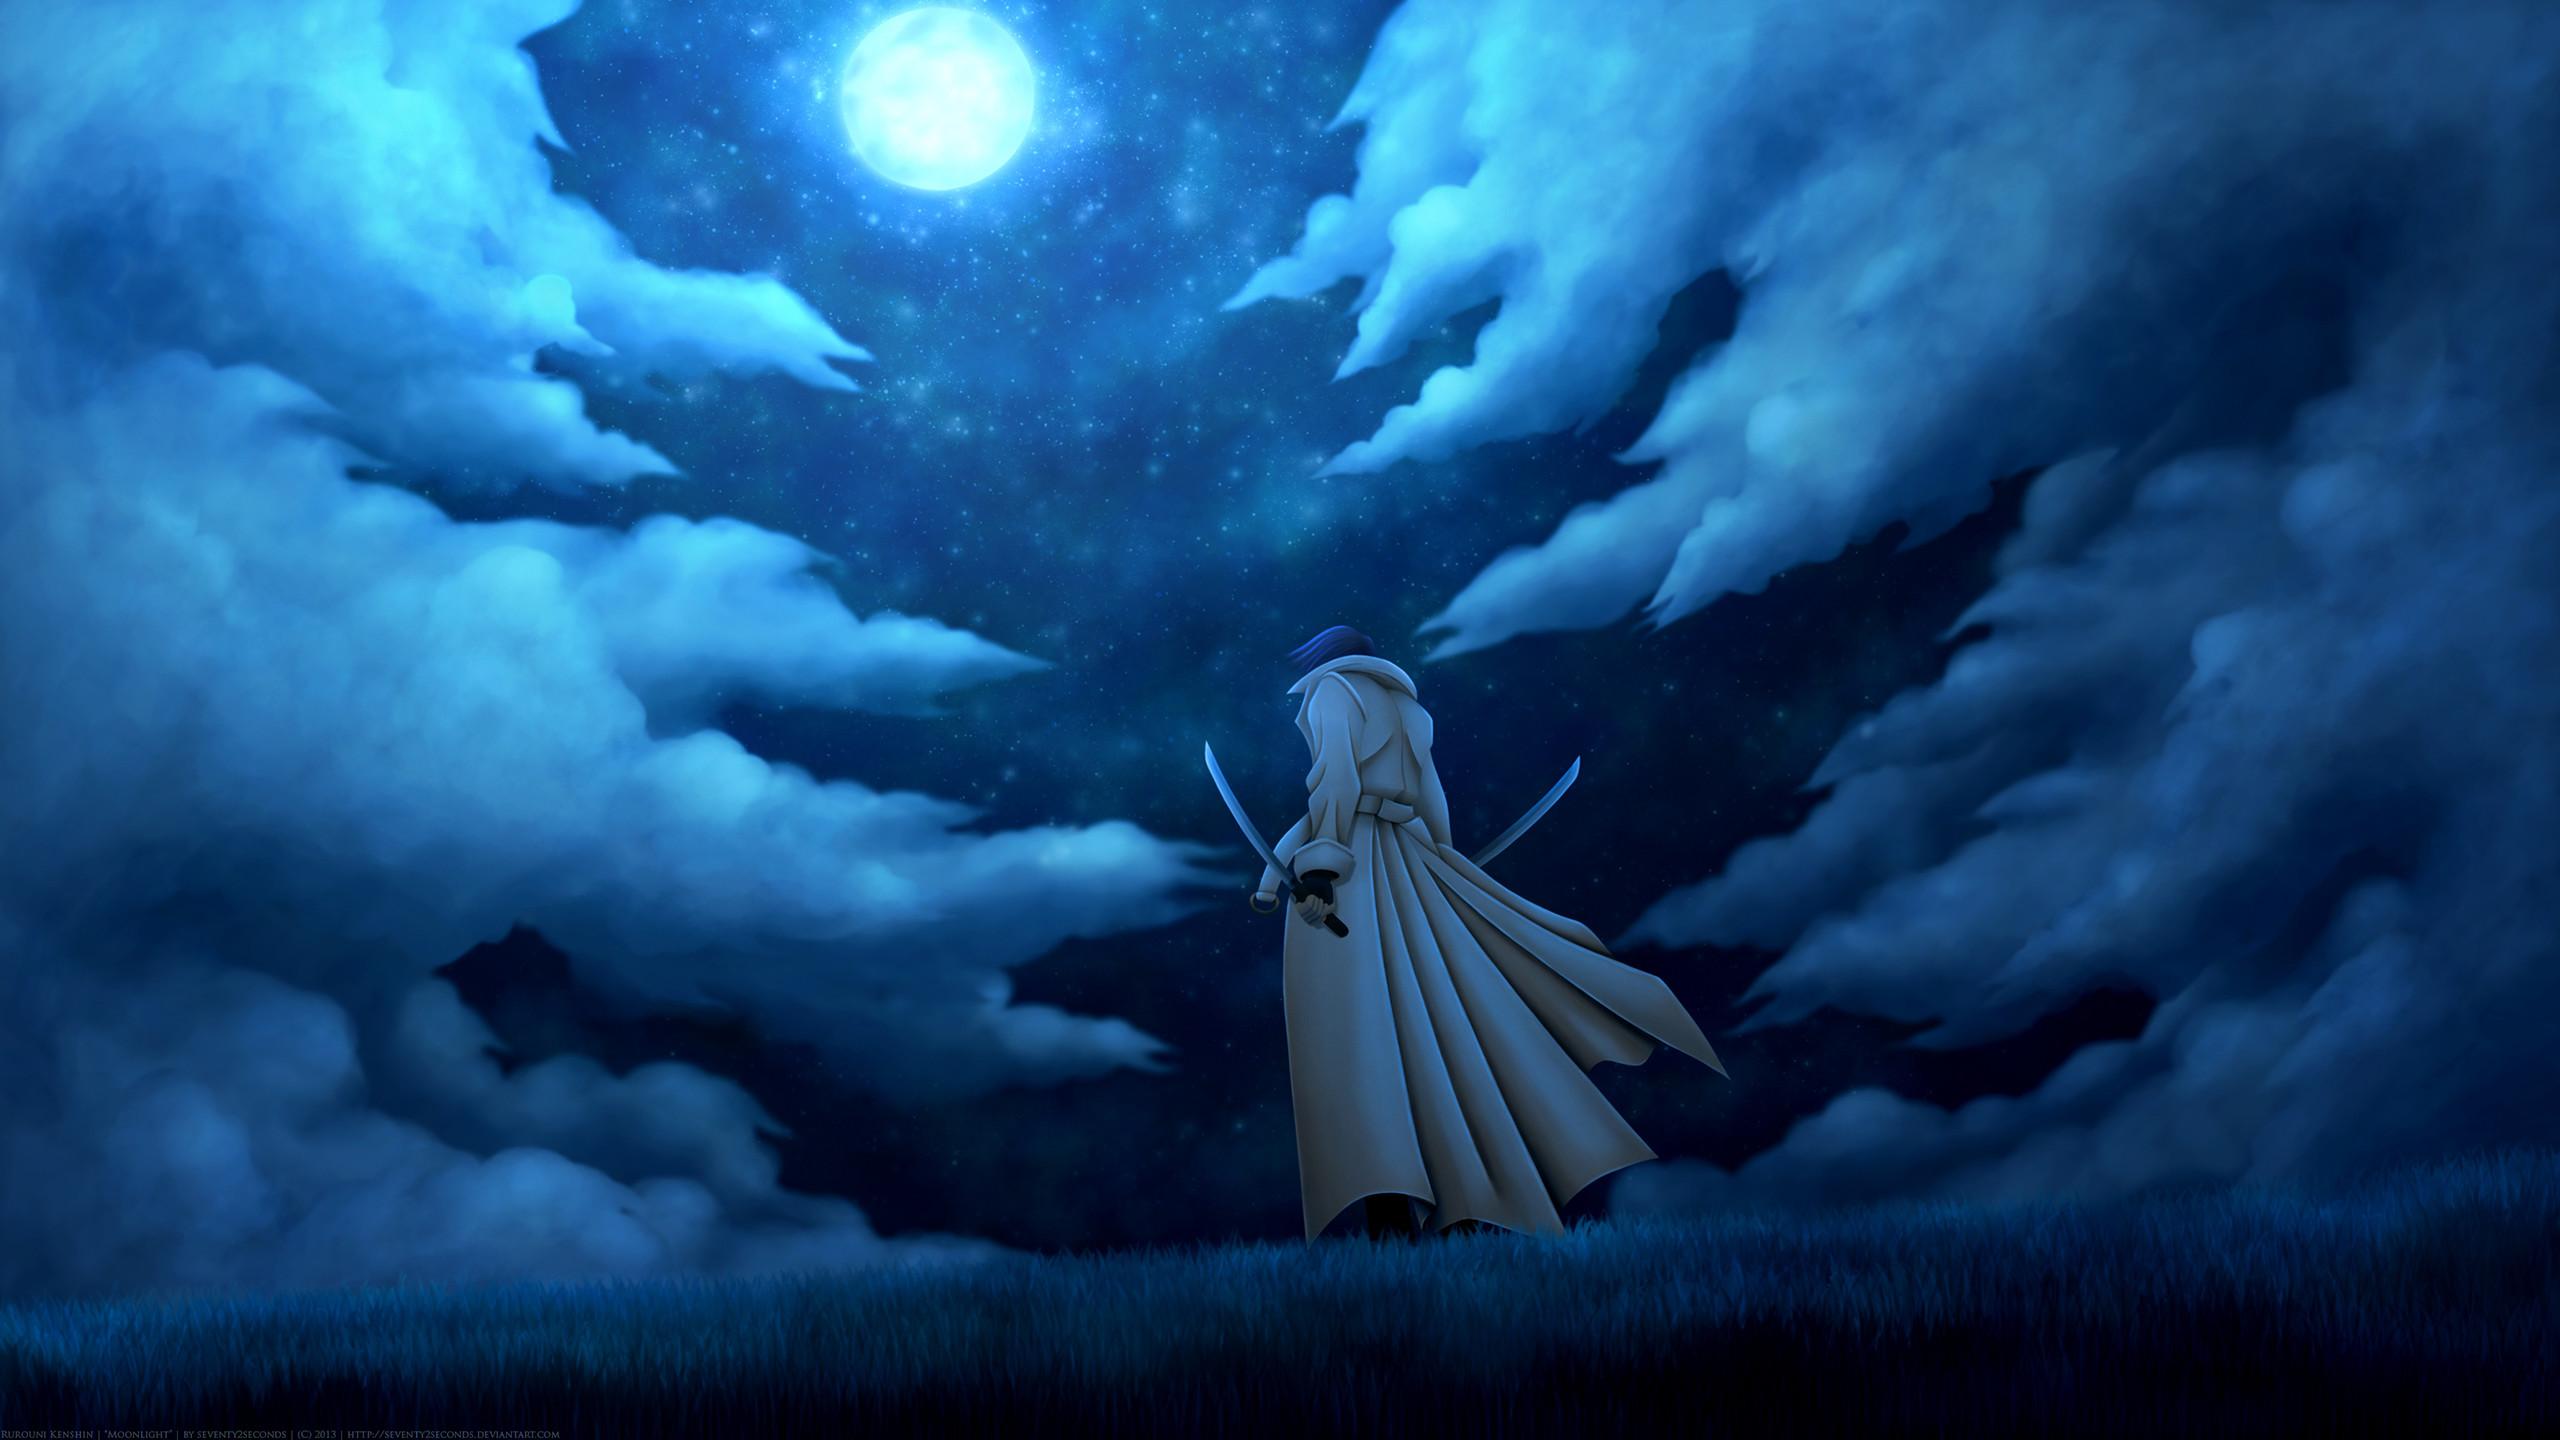 Windows 10 Wallpapers Girl Forest Kenshin Himura Wallpaper 55 Images